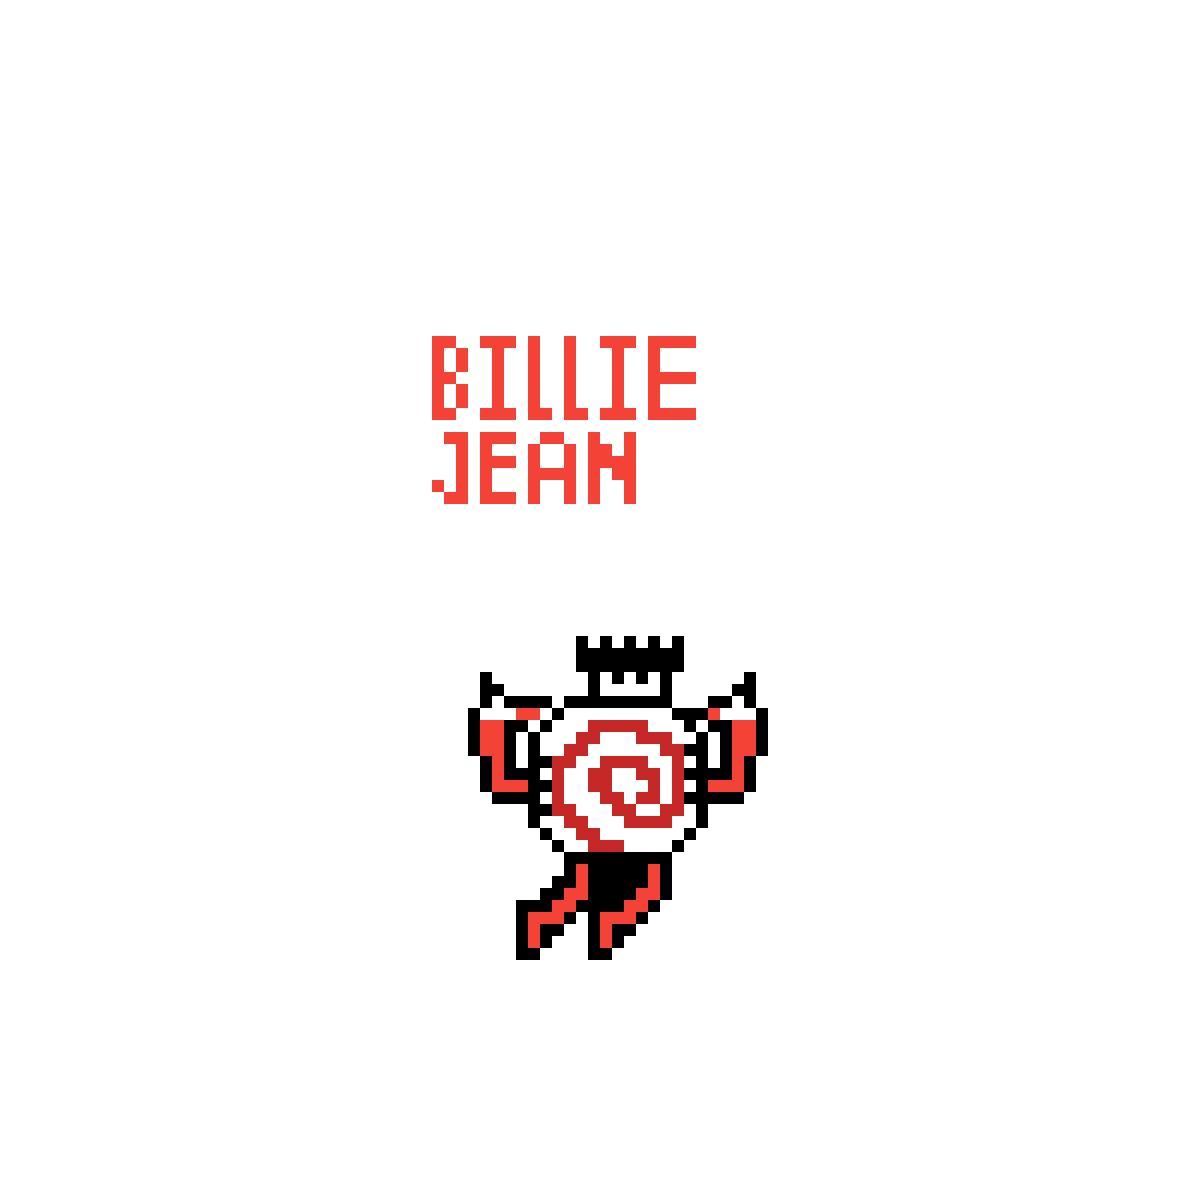 Billie Jean by Crow